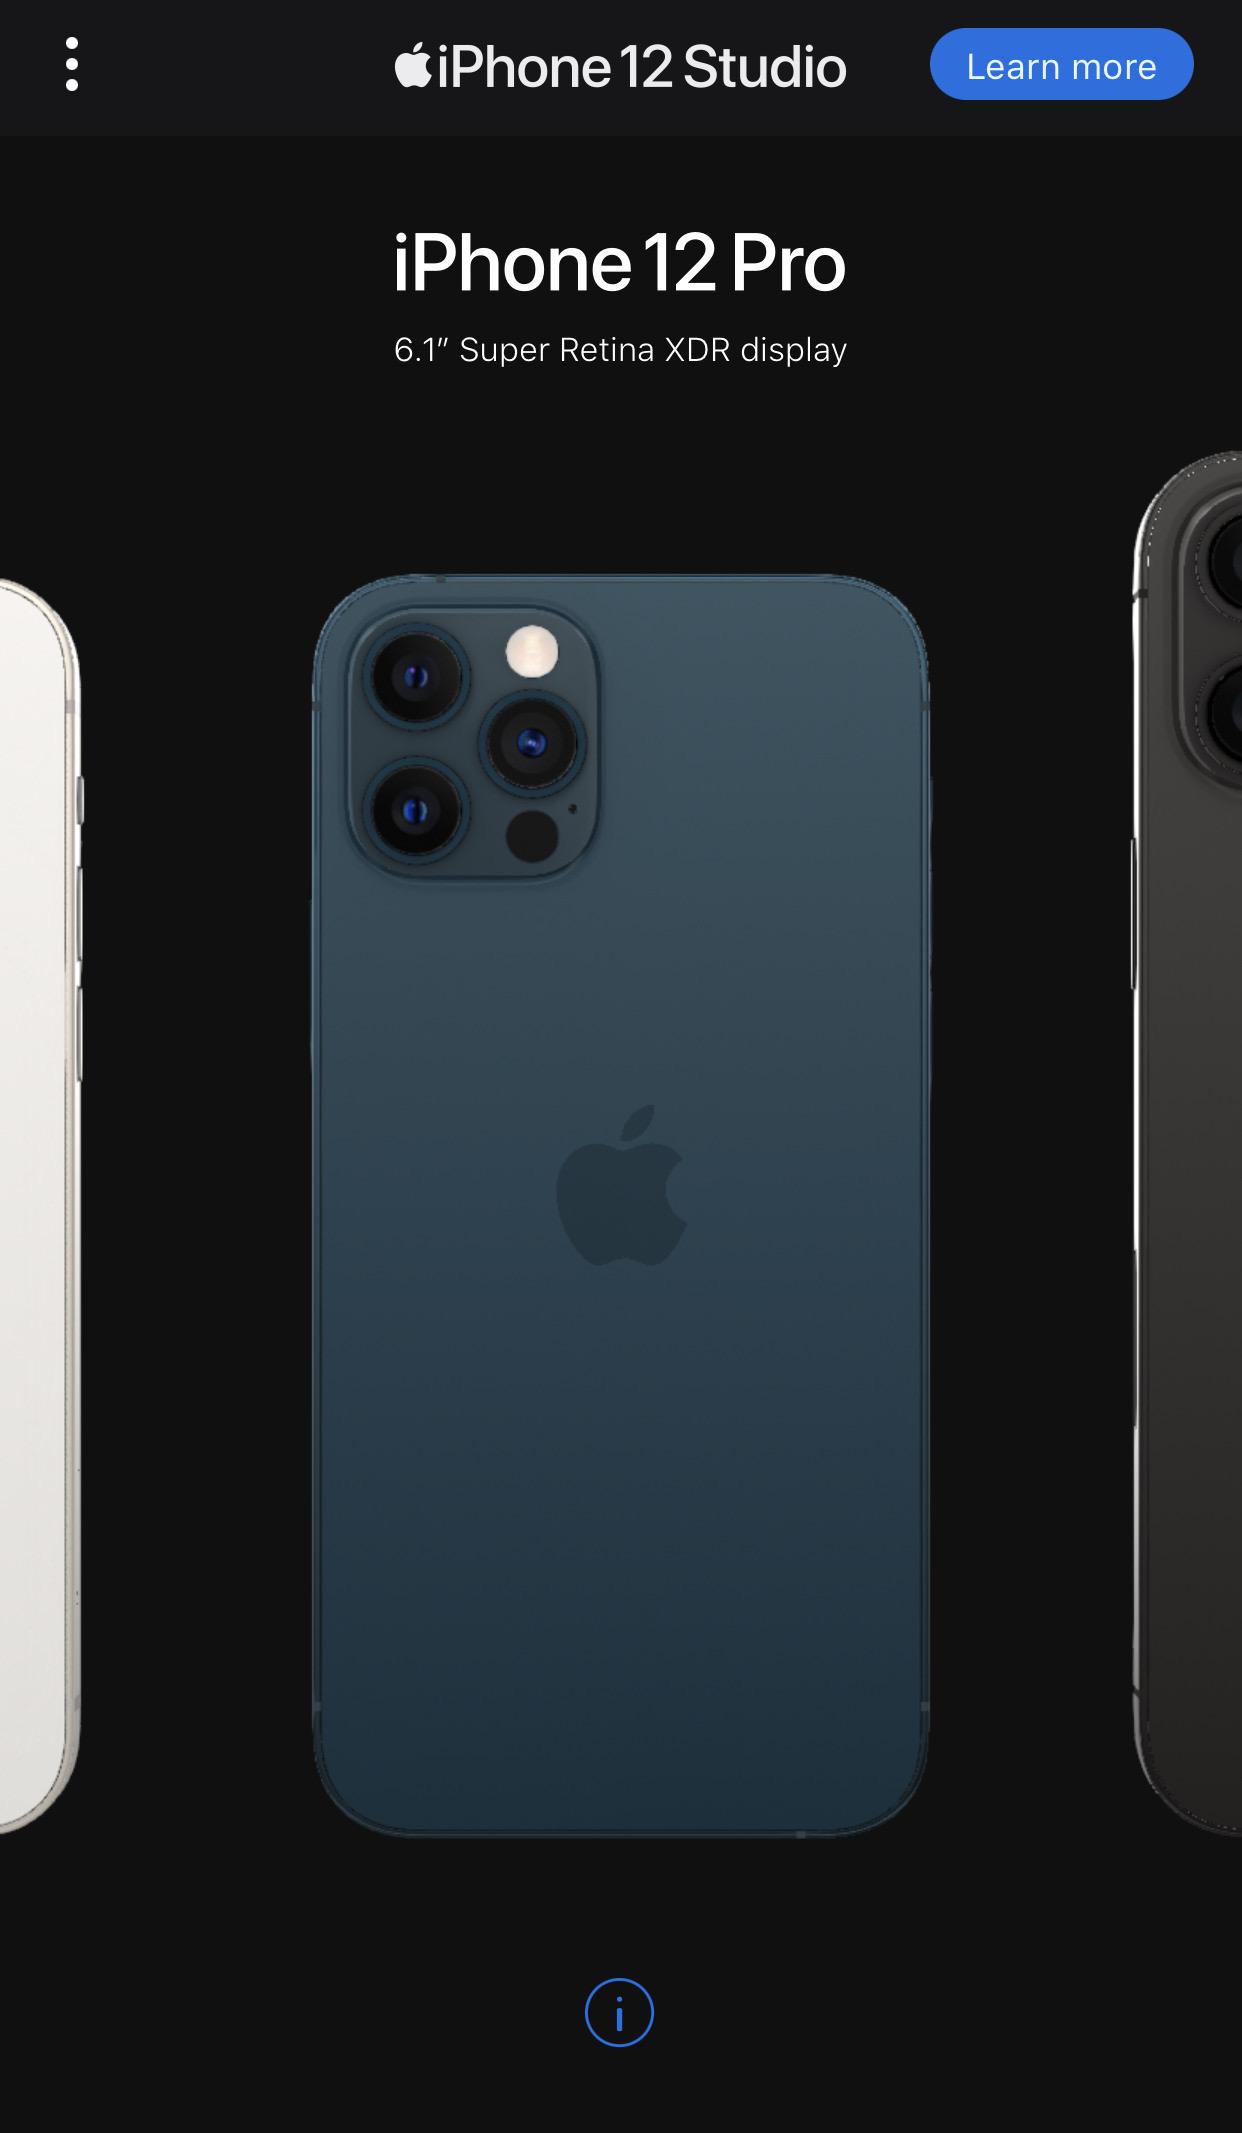 iPhone 12シリーズとケース&ウォレットの組み合わせが確認できる「iPhone 12 Studio」